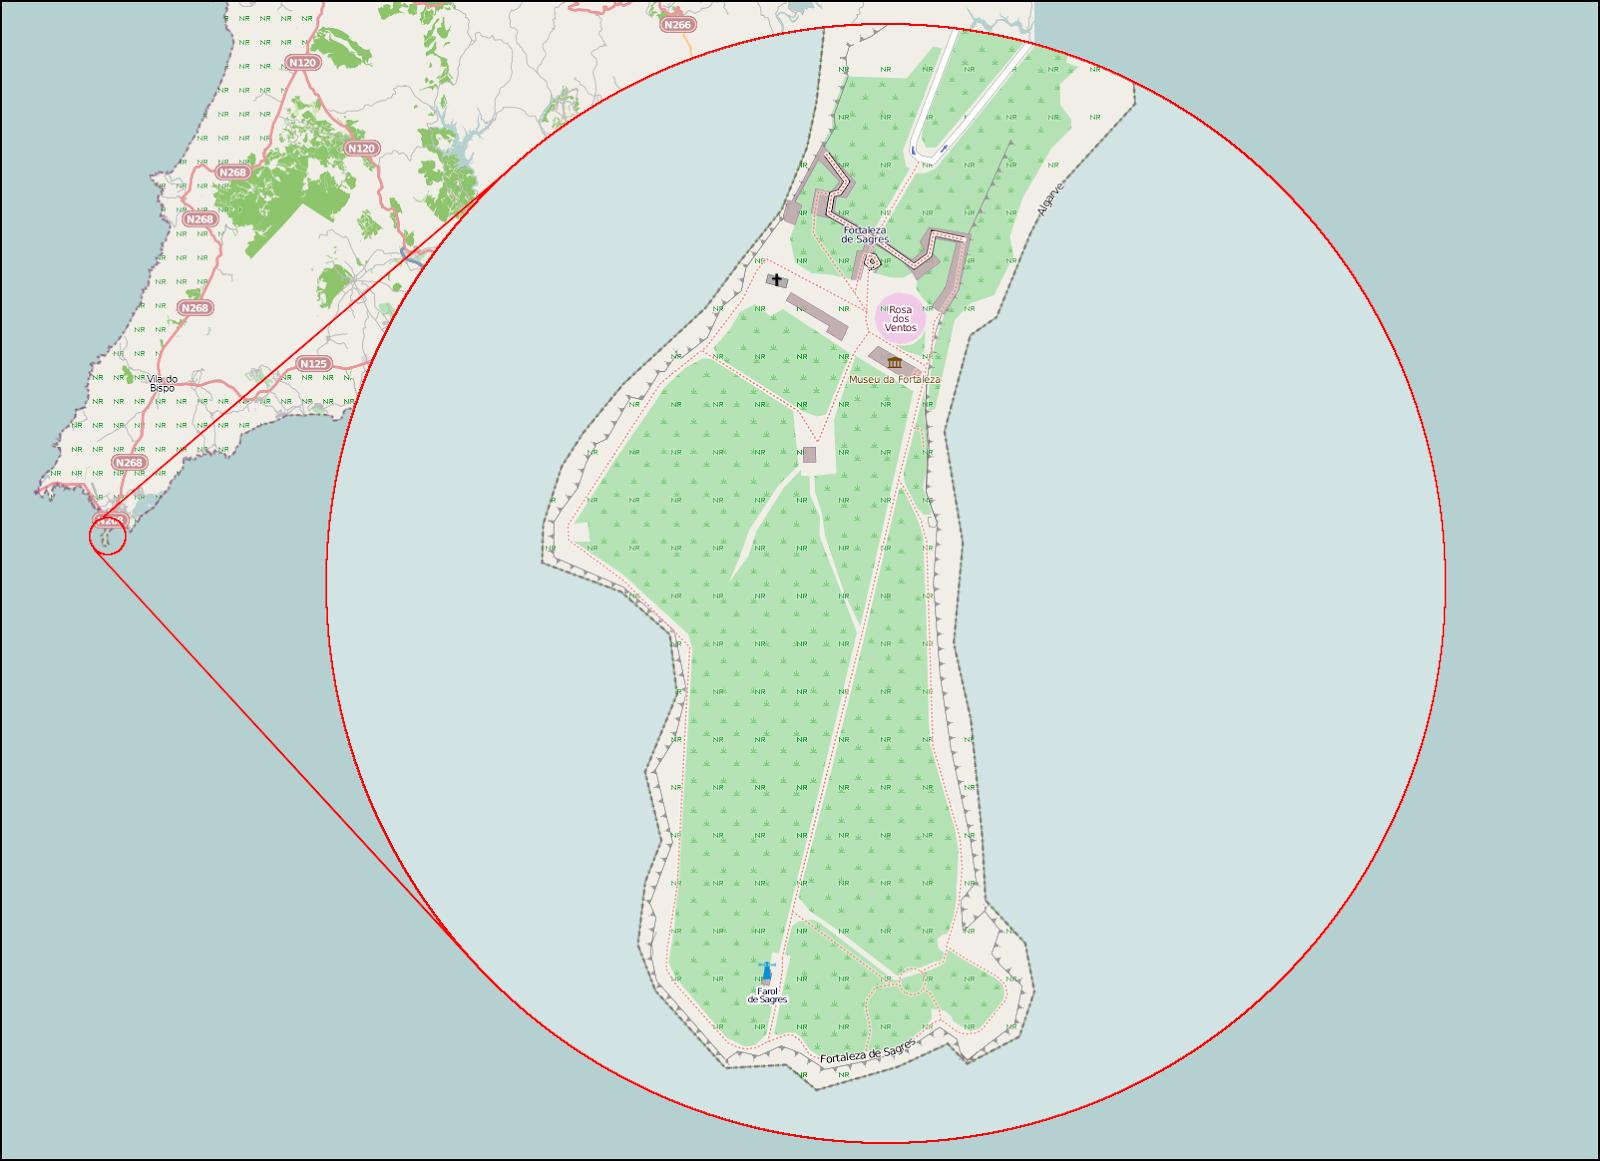 Map data ©OpenStreetMap.